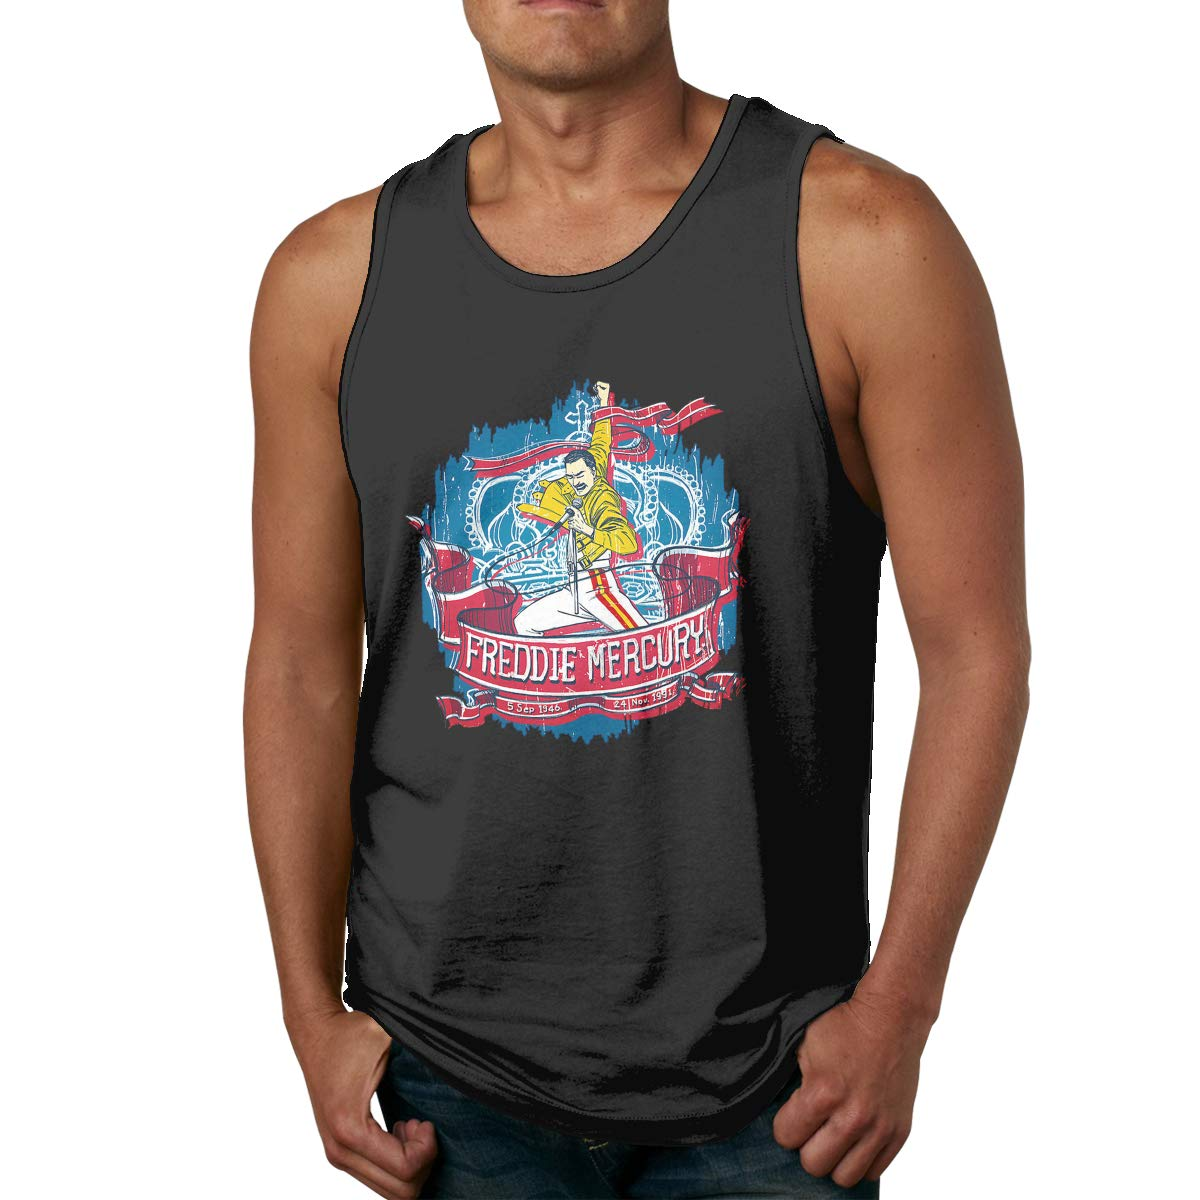 Ueseu Adult S Freddie Mercury Training Sleeveless Tank Top100 Shirts